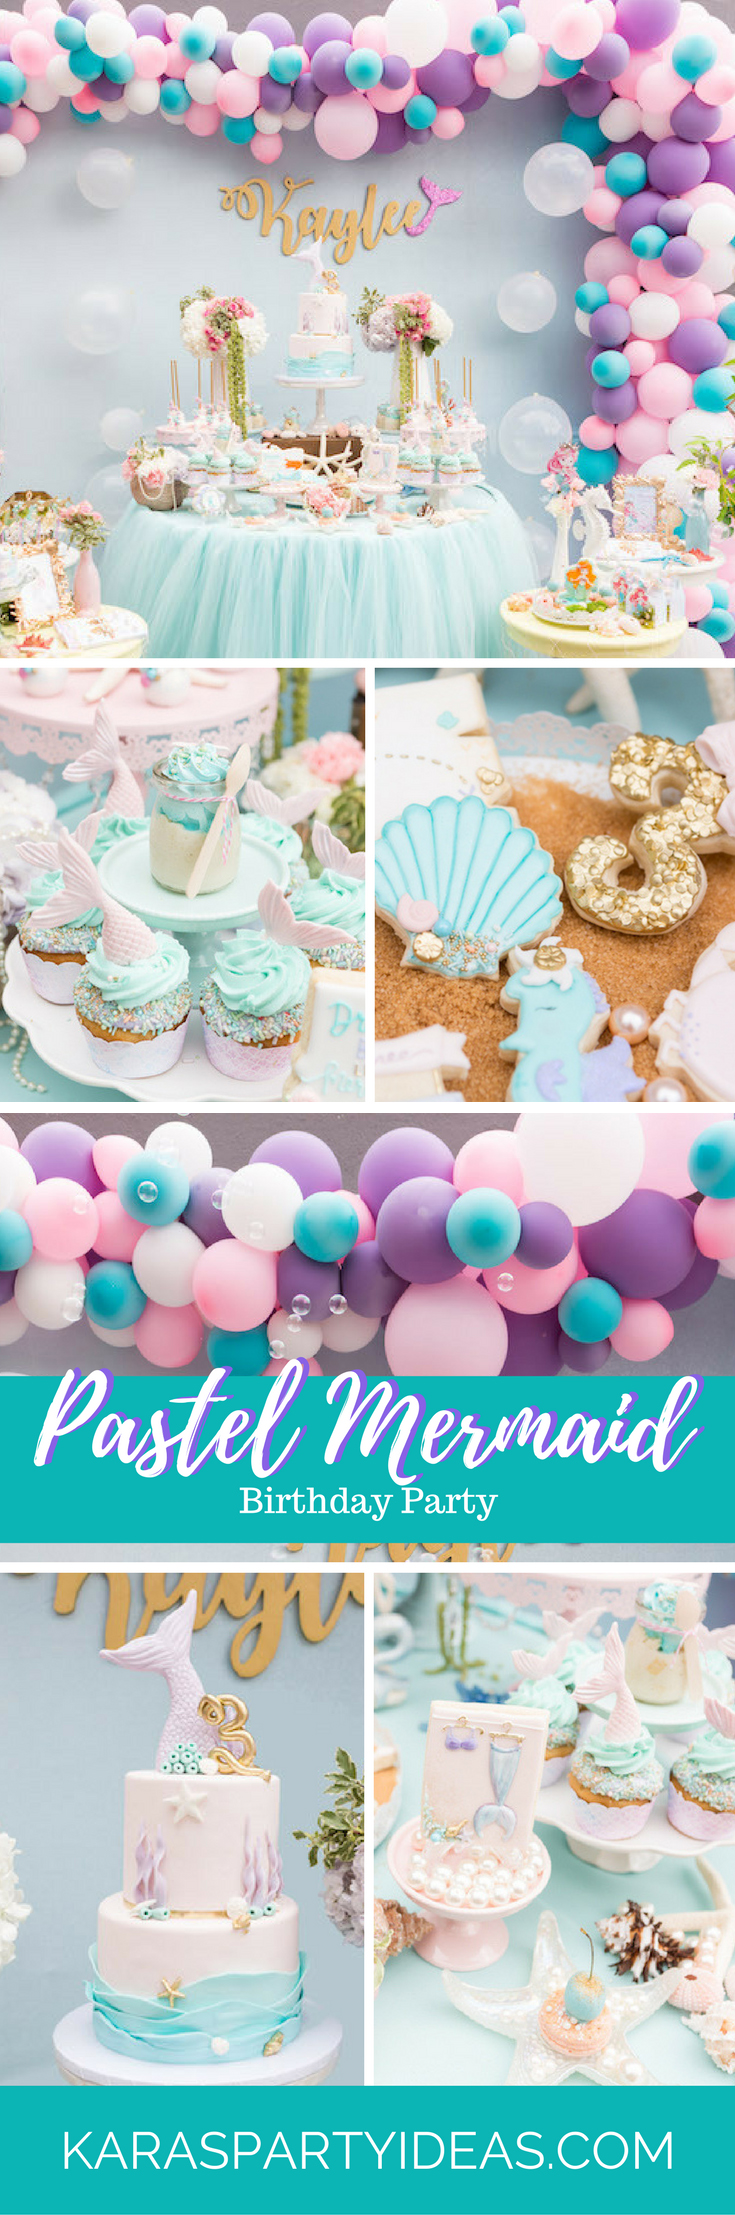 Pastel Mermaid Birthday Party via Kara's Party Ideas | KarasPartyIdeas.com